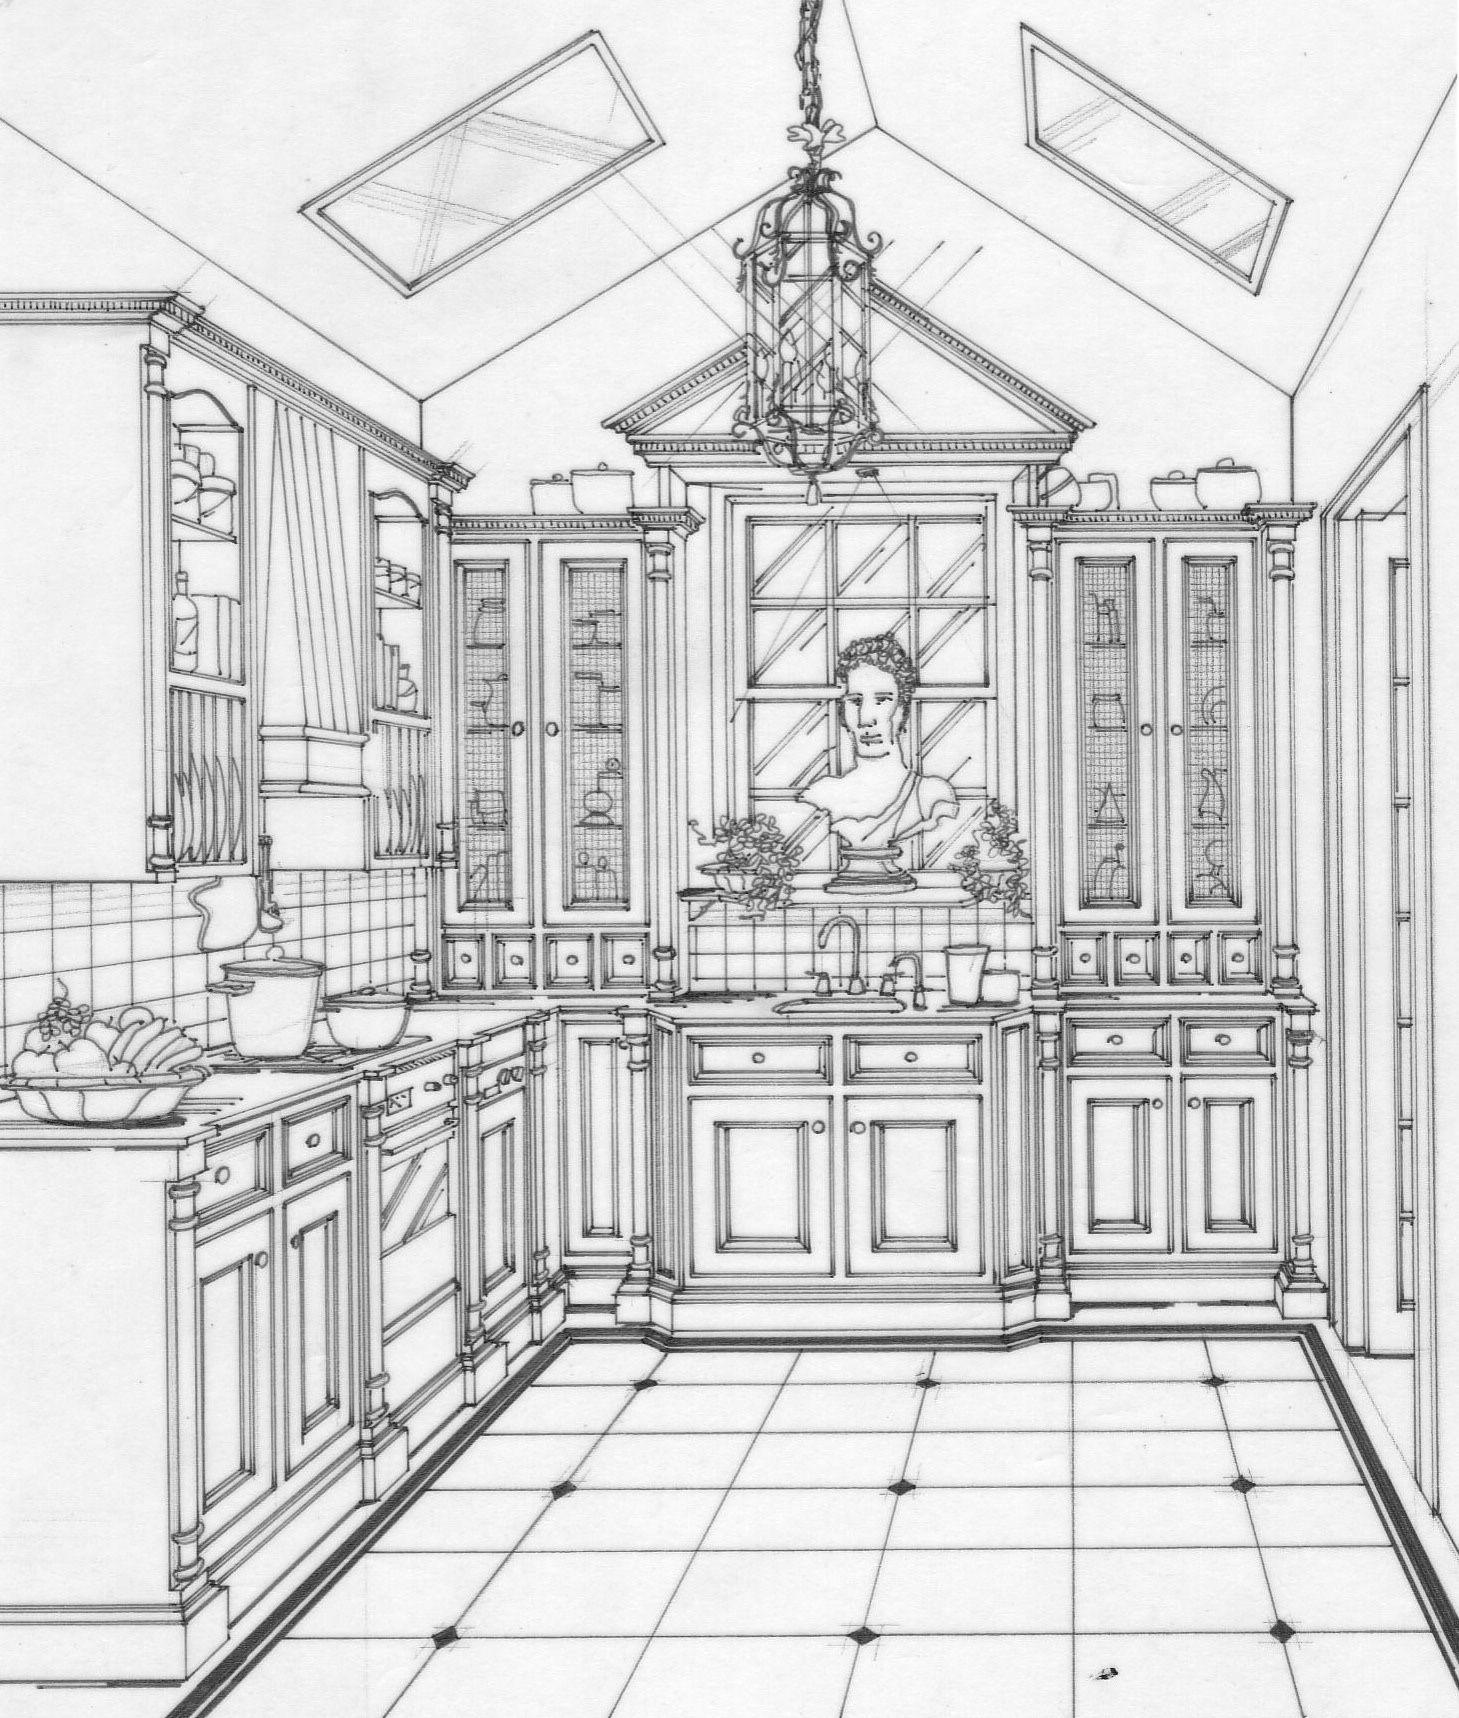 Kitchen Concept Drawing Paddington Nsw Kitchen Concepts Decor Interior Design Design